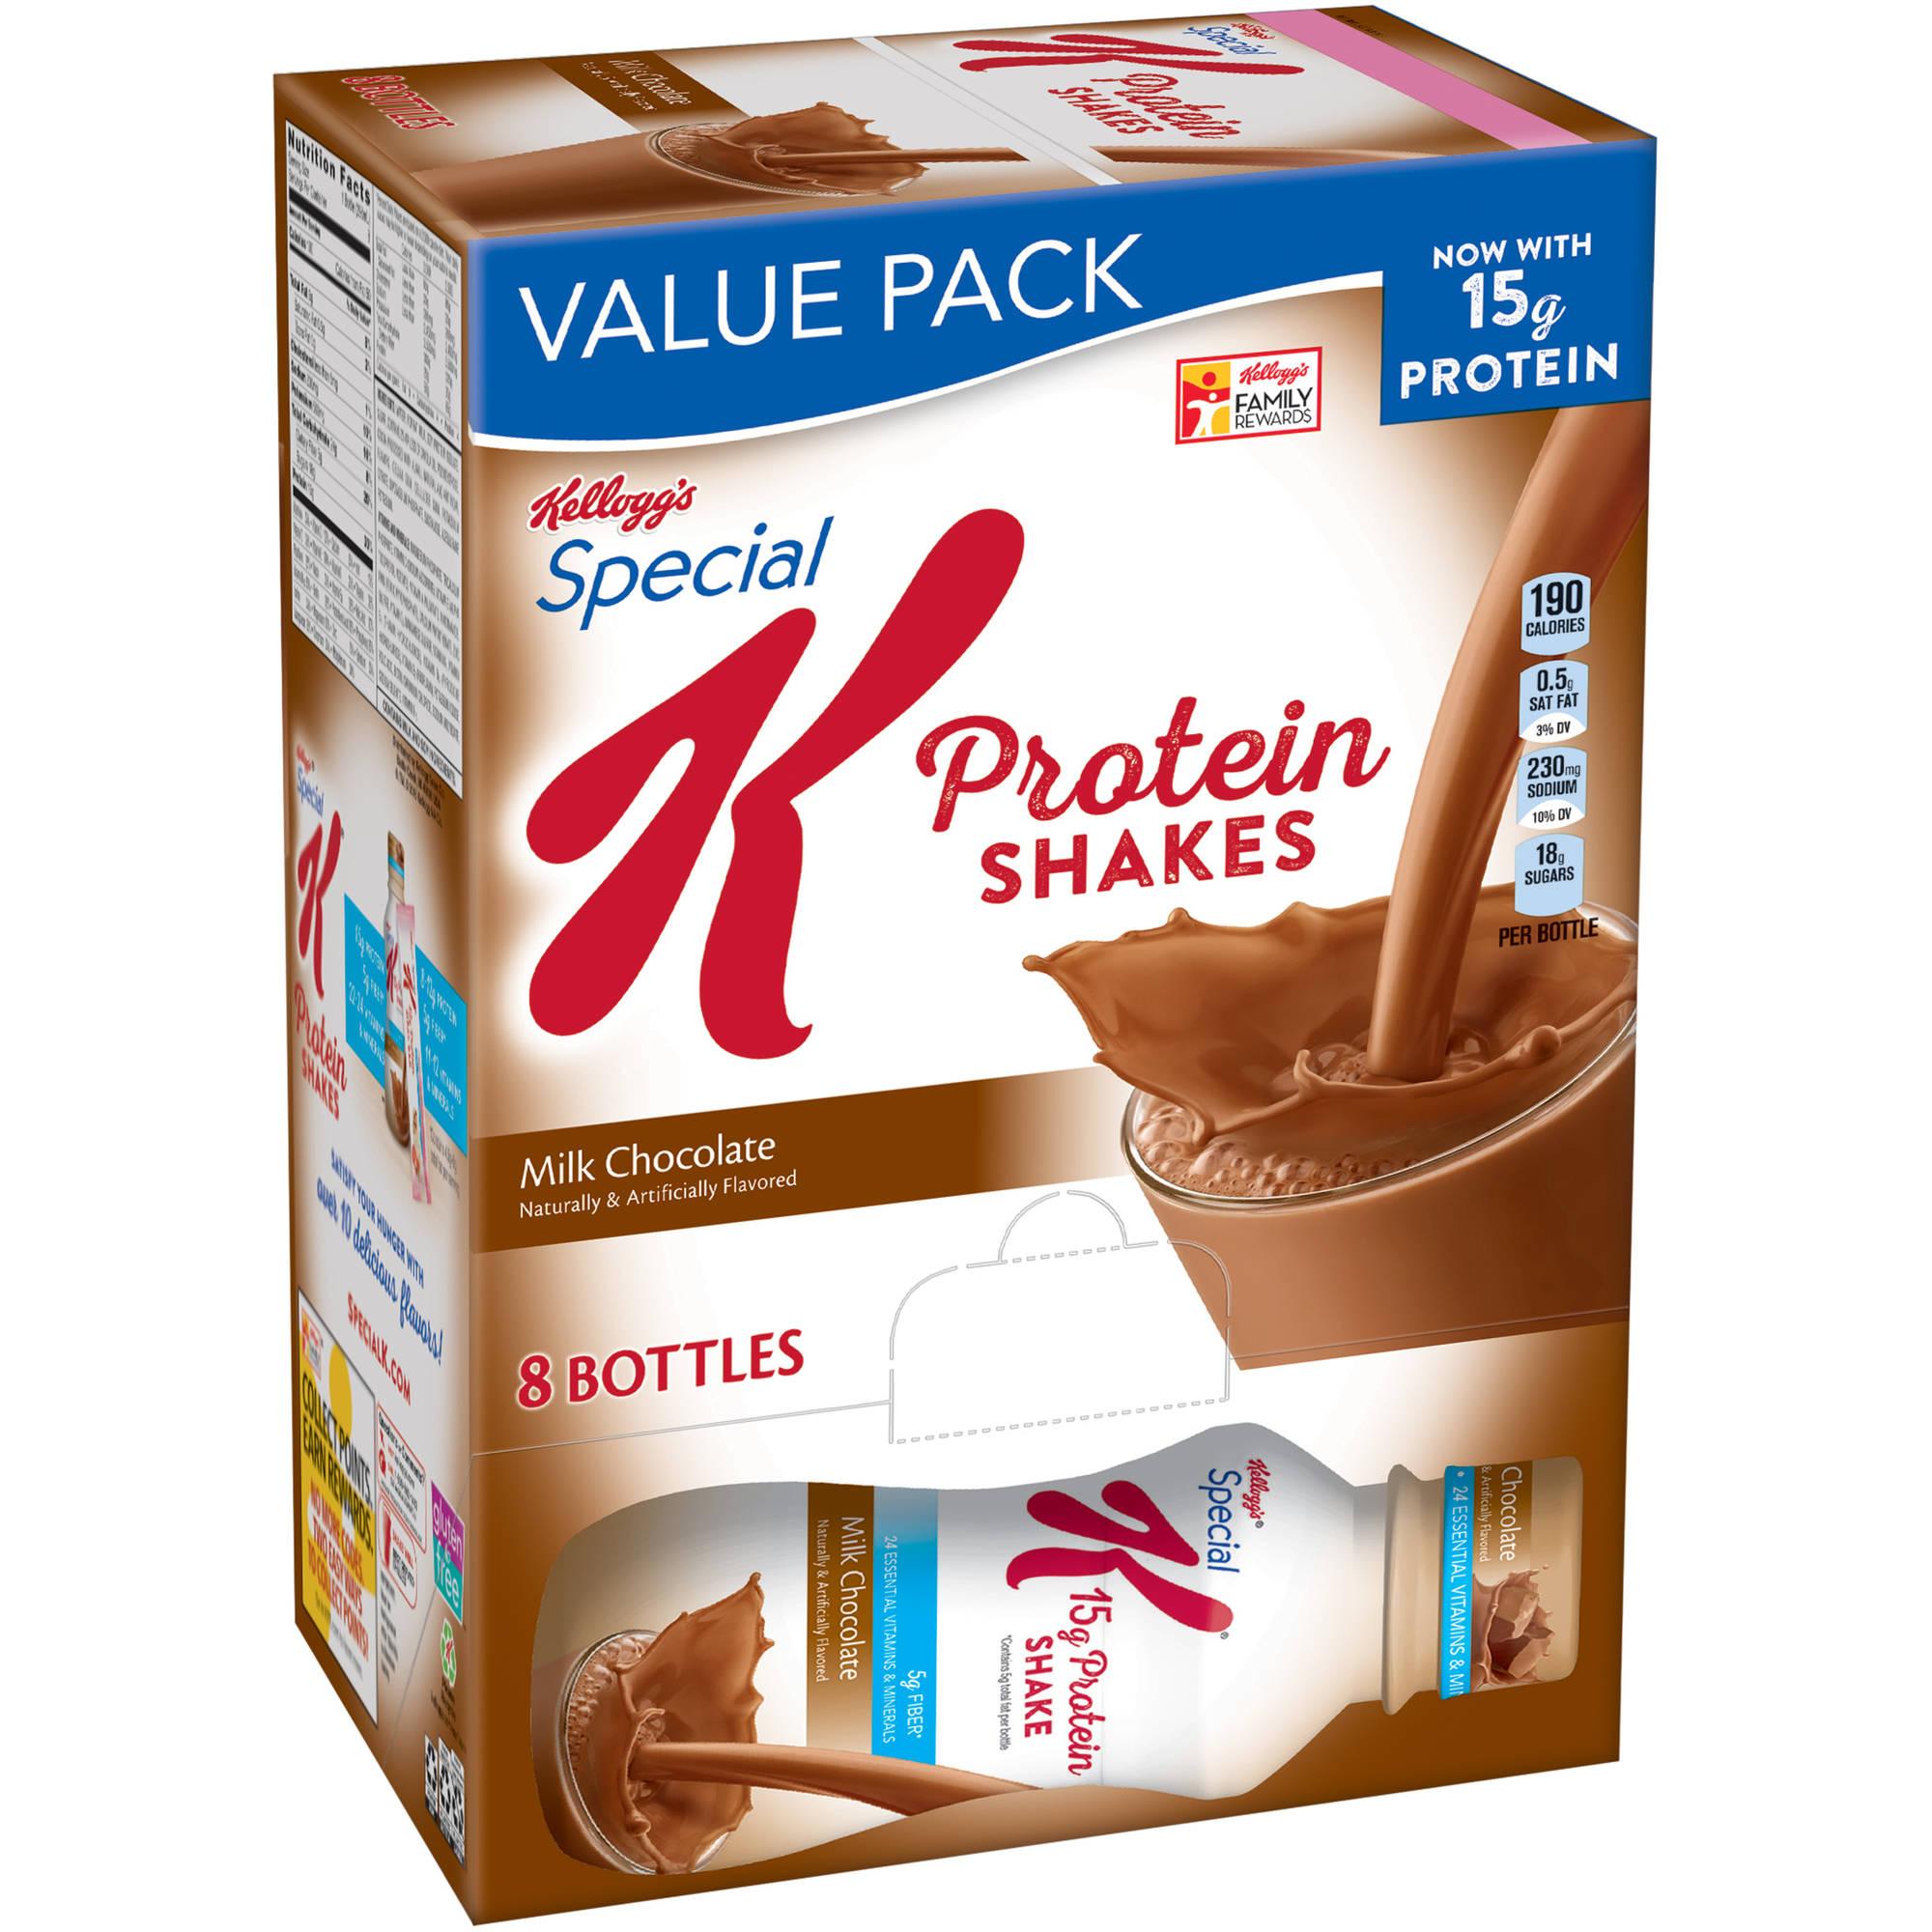 Kellogg's Special K Milk Chocolate Protein Shake, 10 oz, 8ct